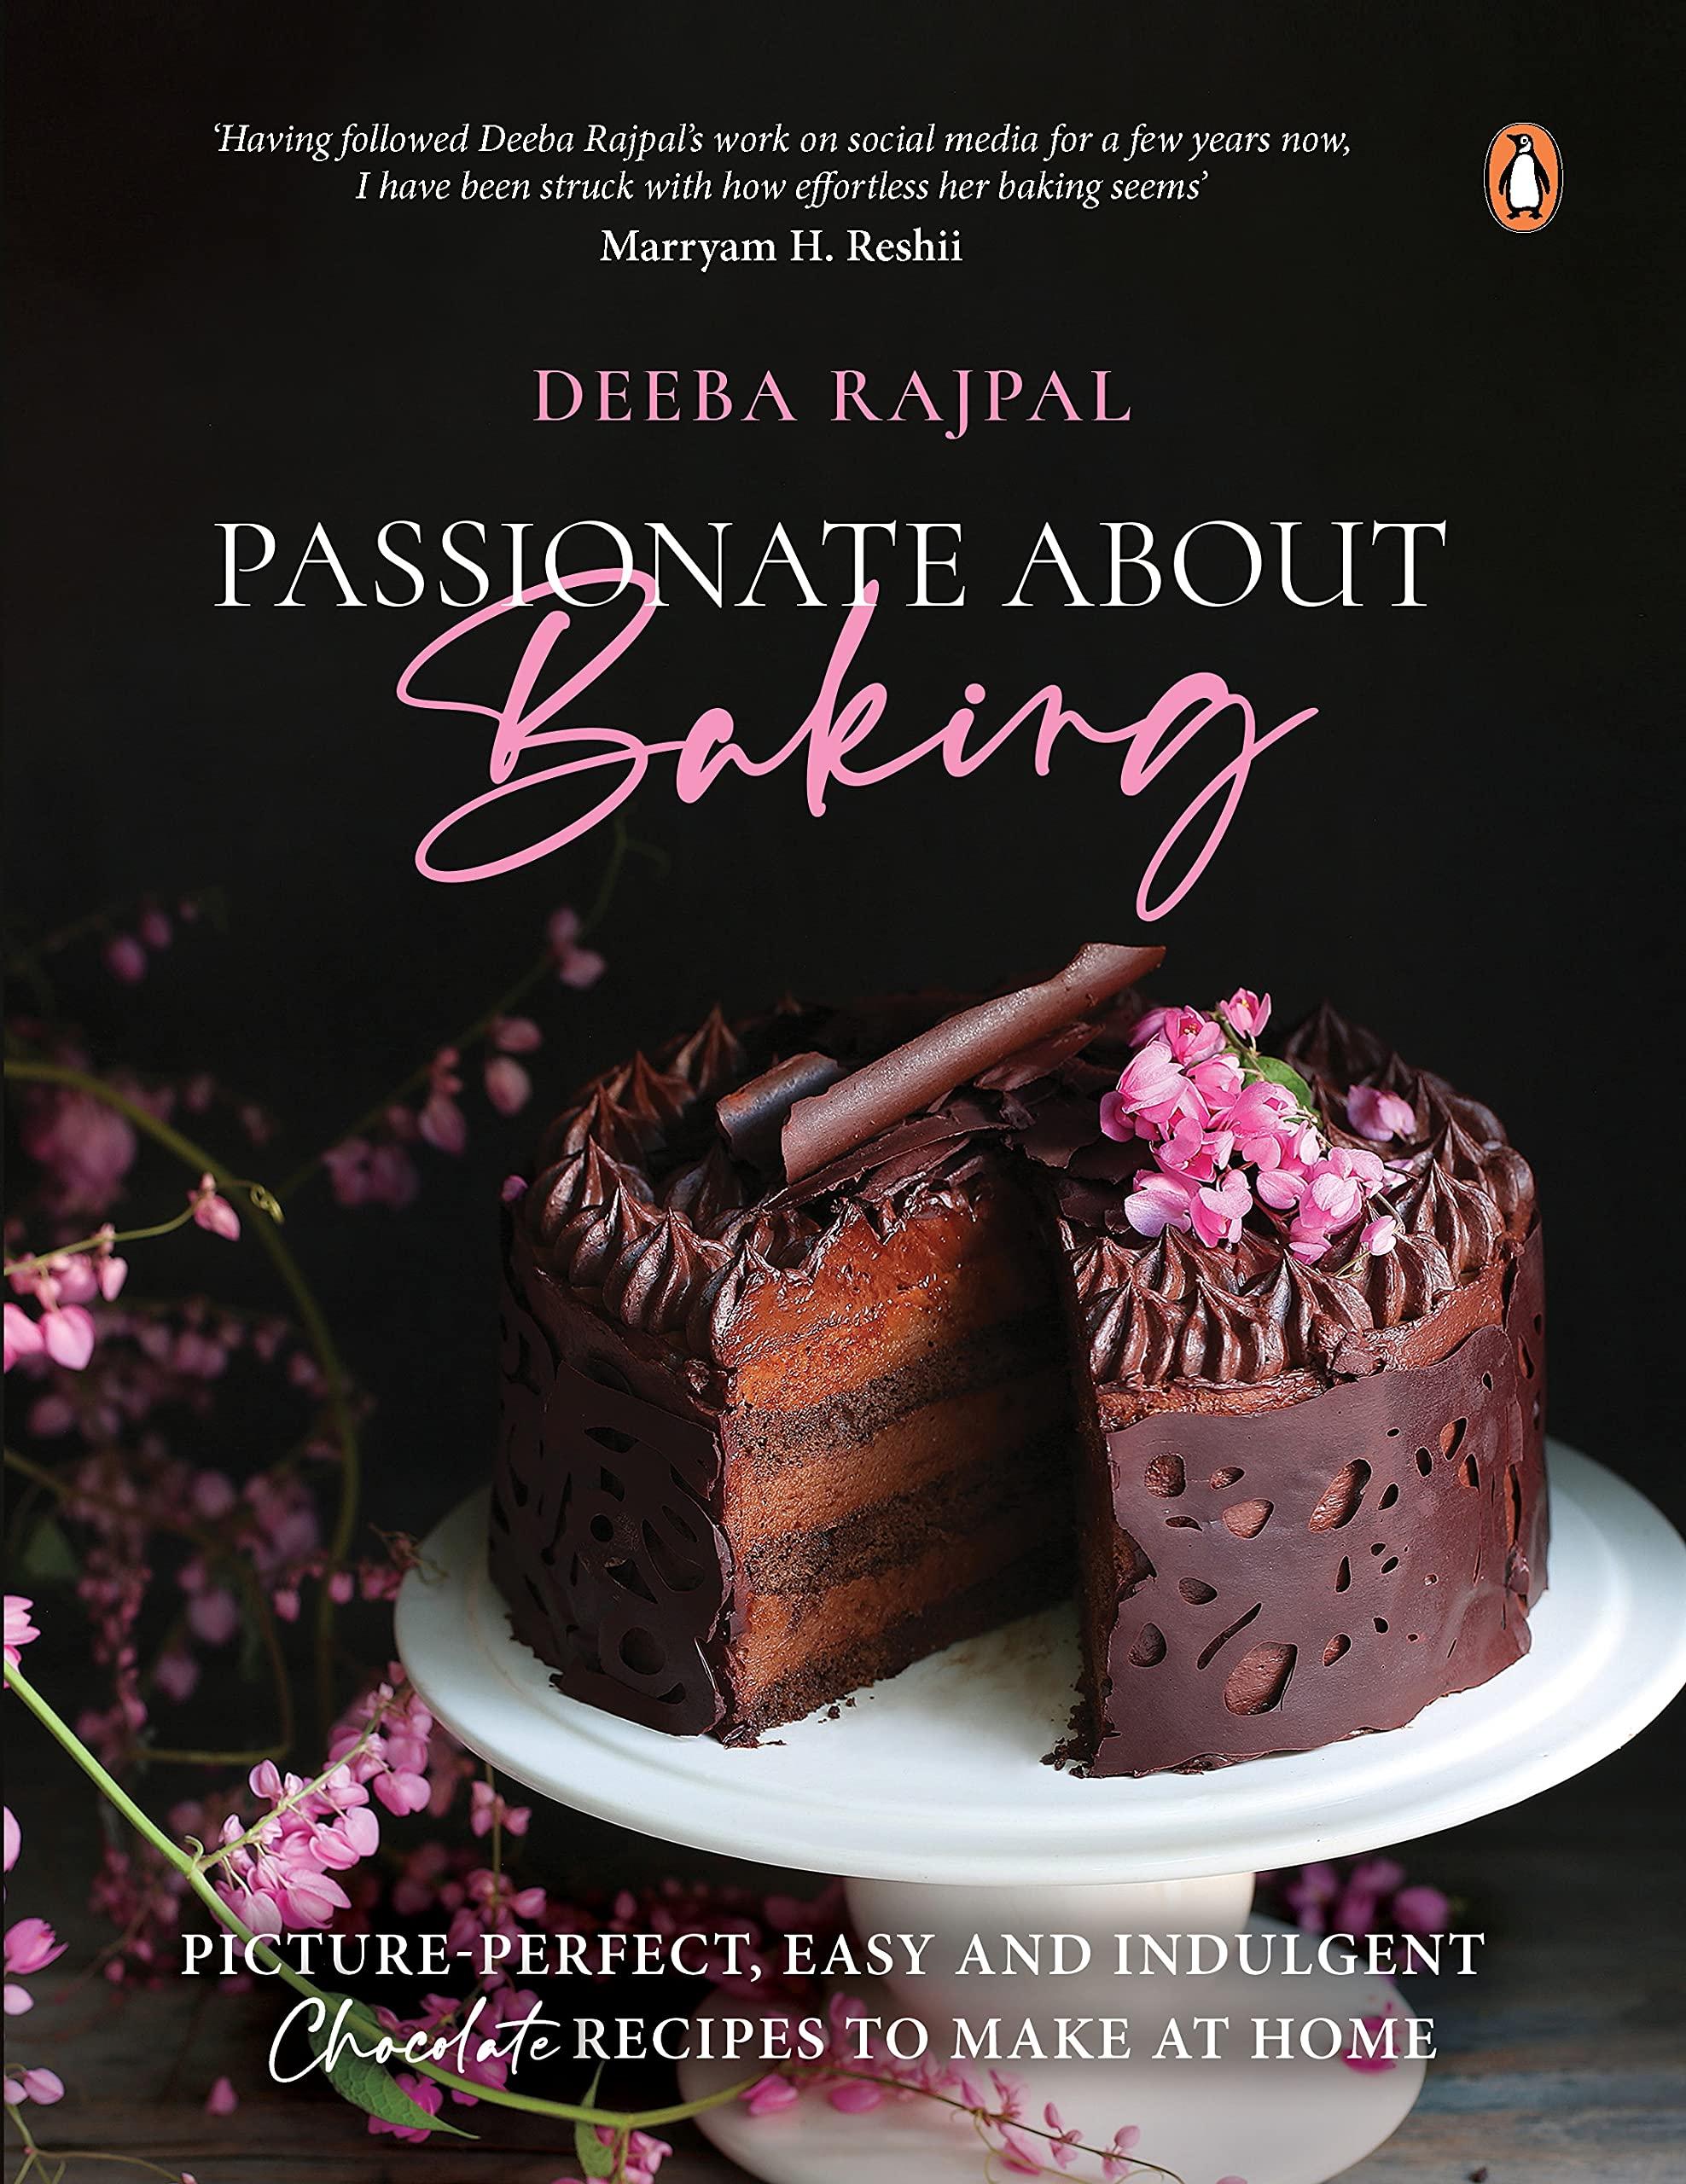 Passionate about Baking – Chocolate by Deeba Rajpal